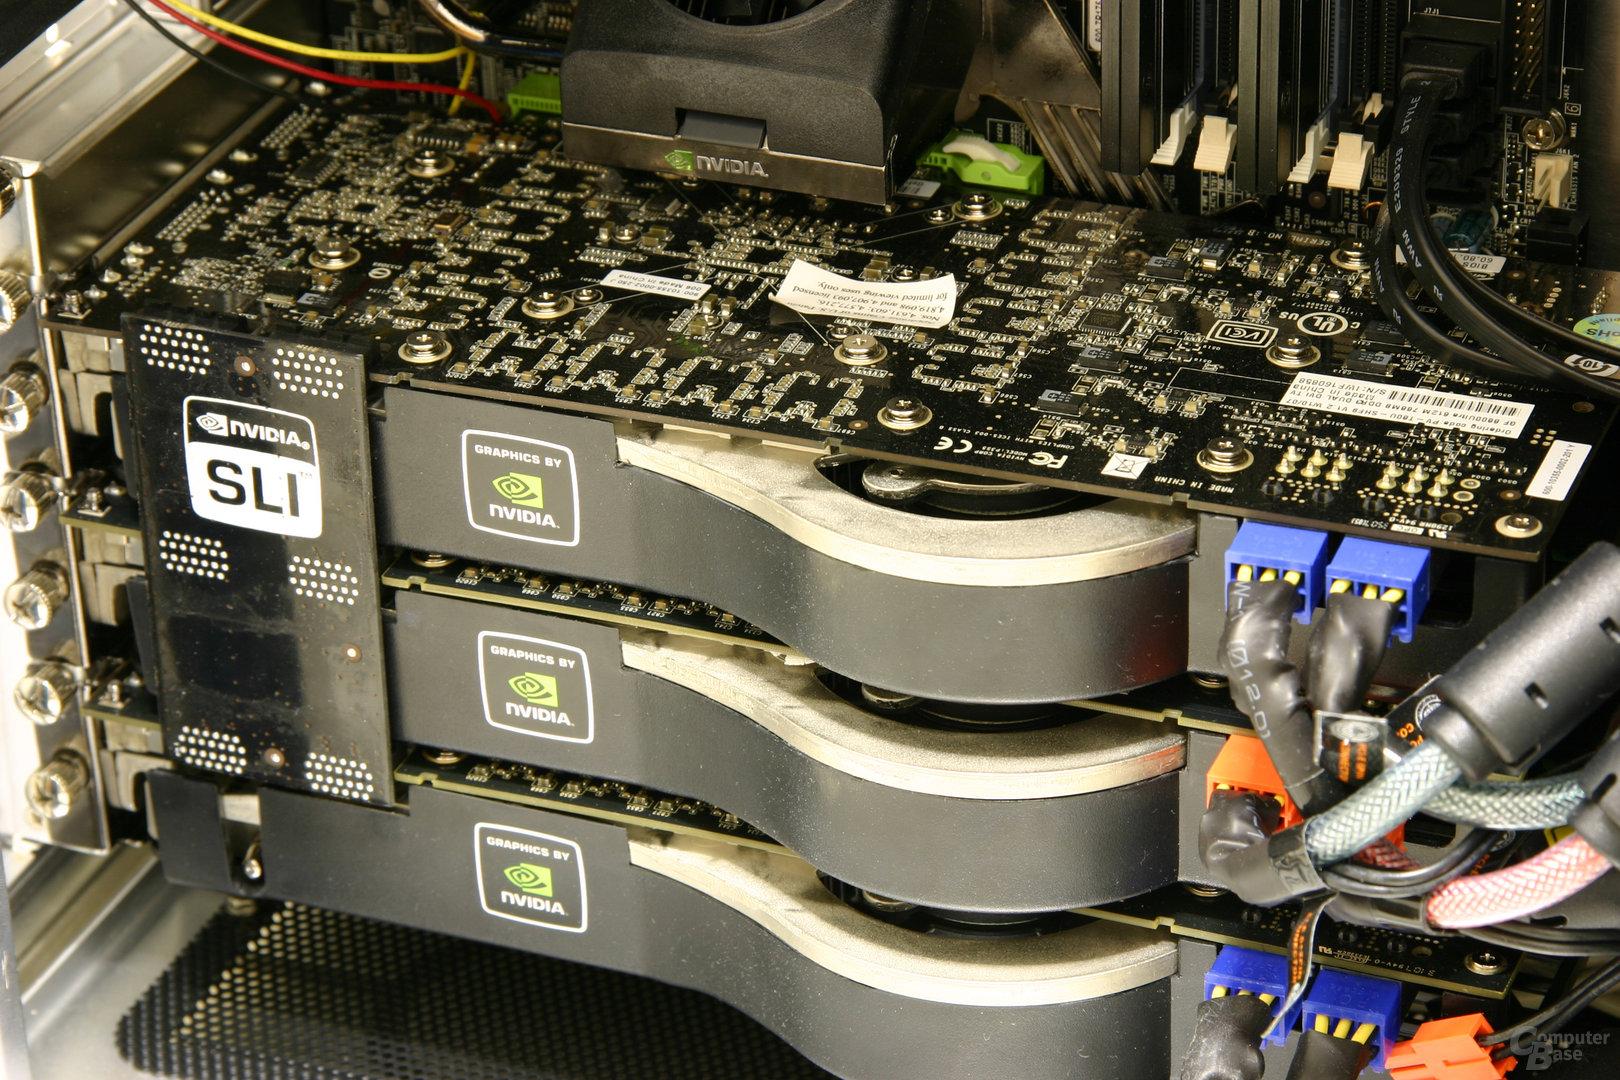 3x GeForce 8800 Ultra